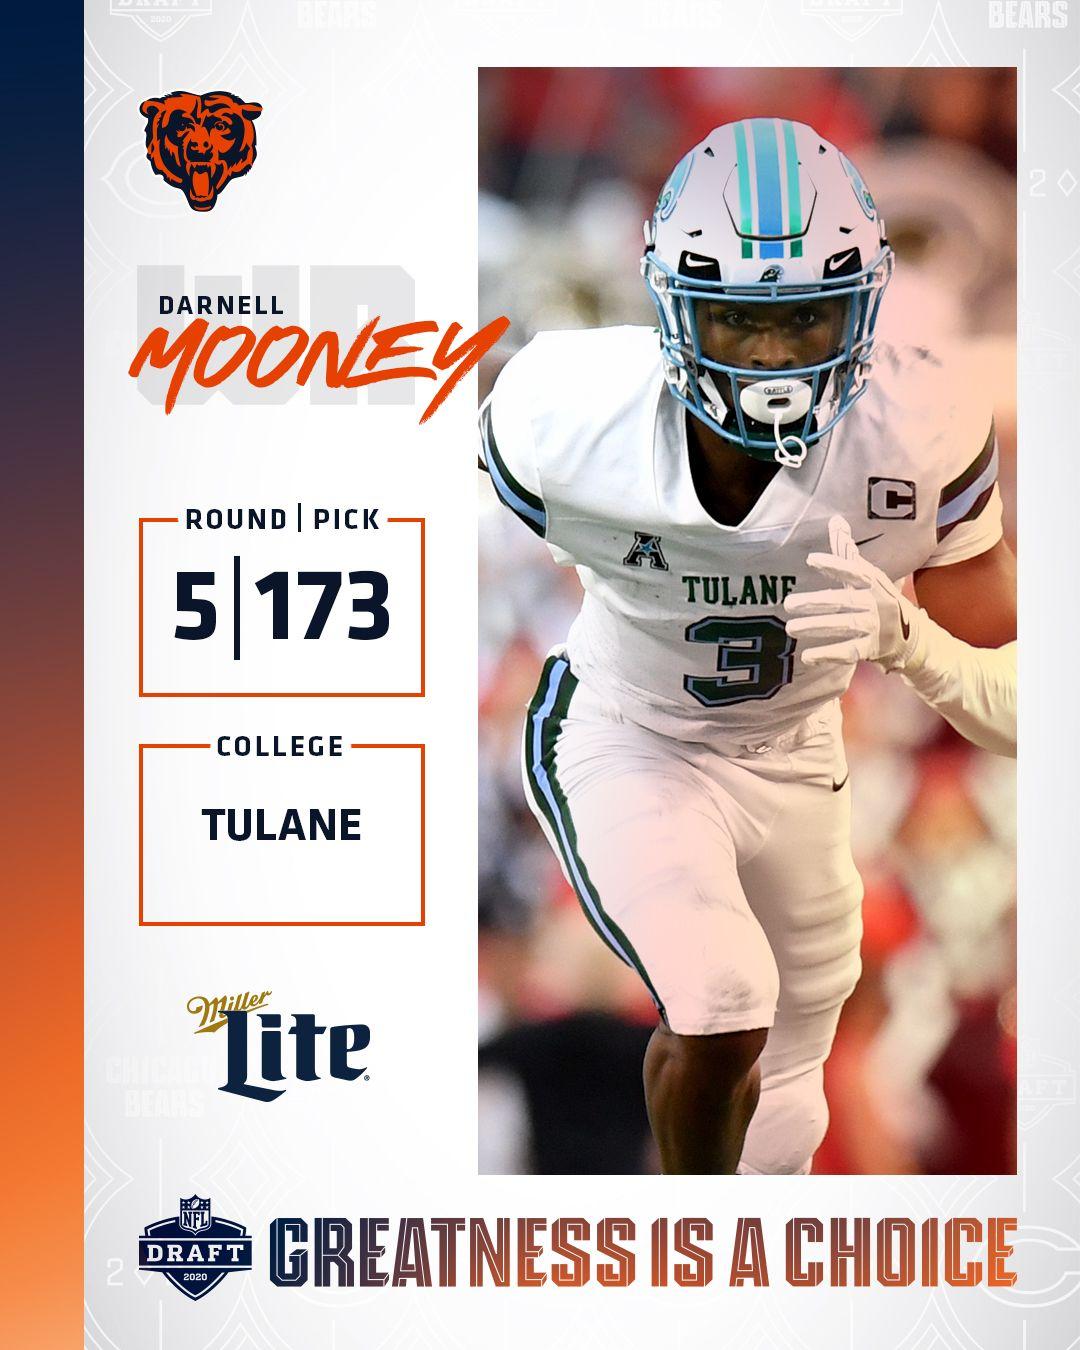 Mooney_Draft_Bears_1080x1350